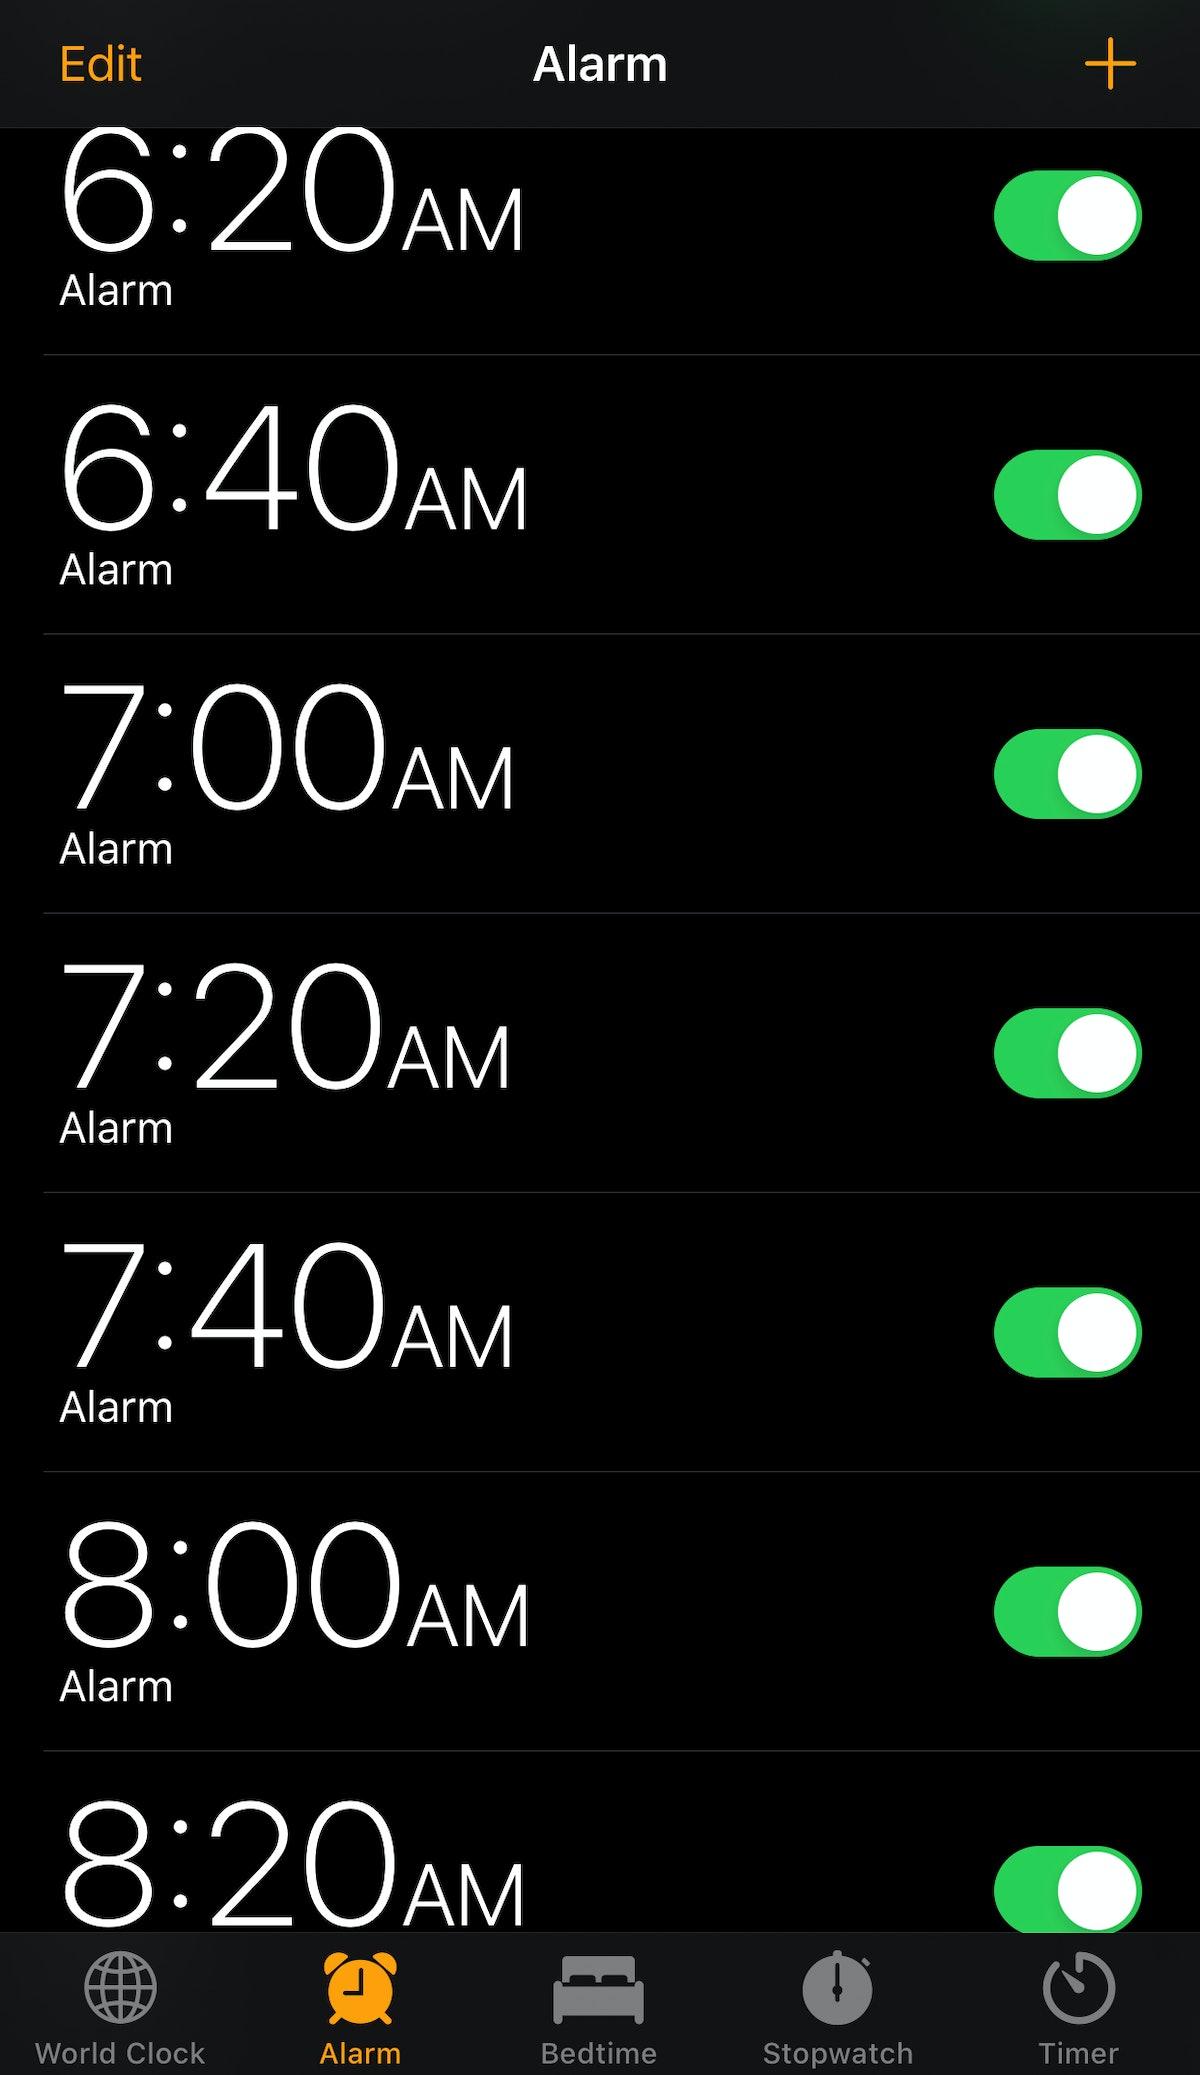 iPhone alarm set at 20 minute intervals